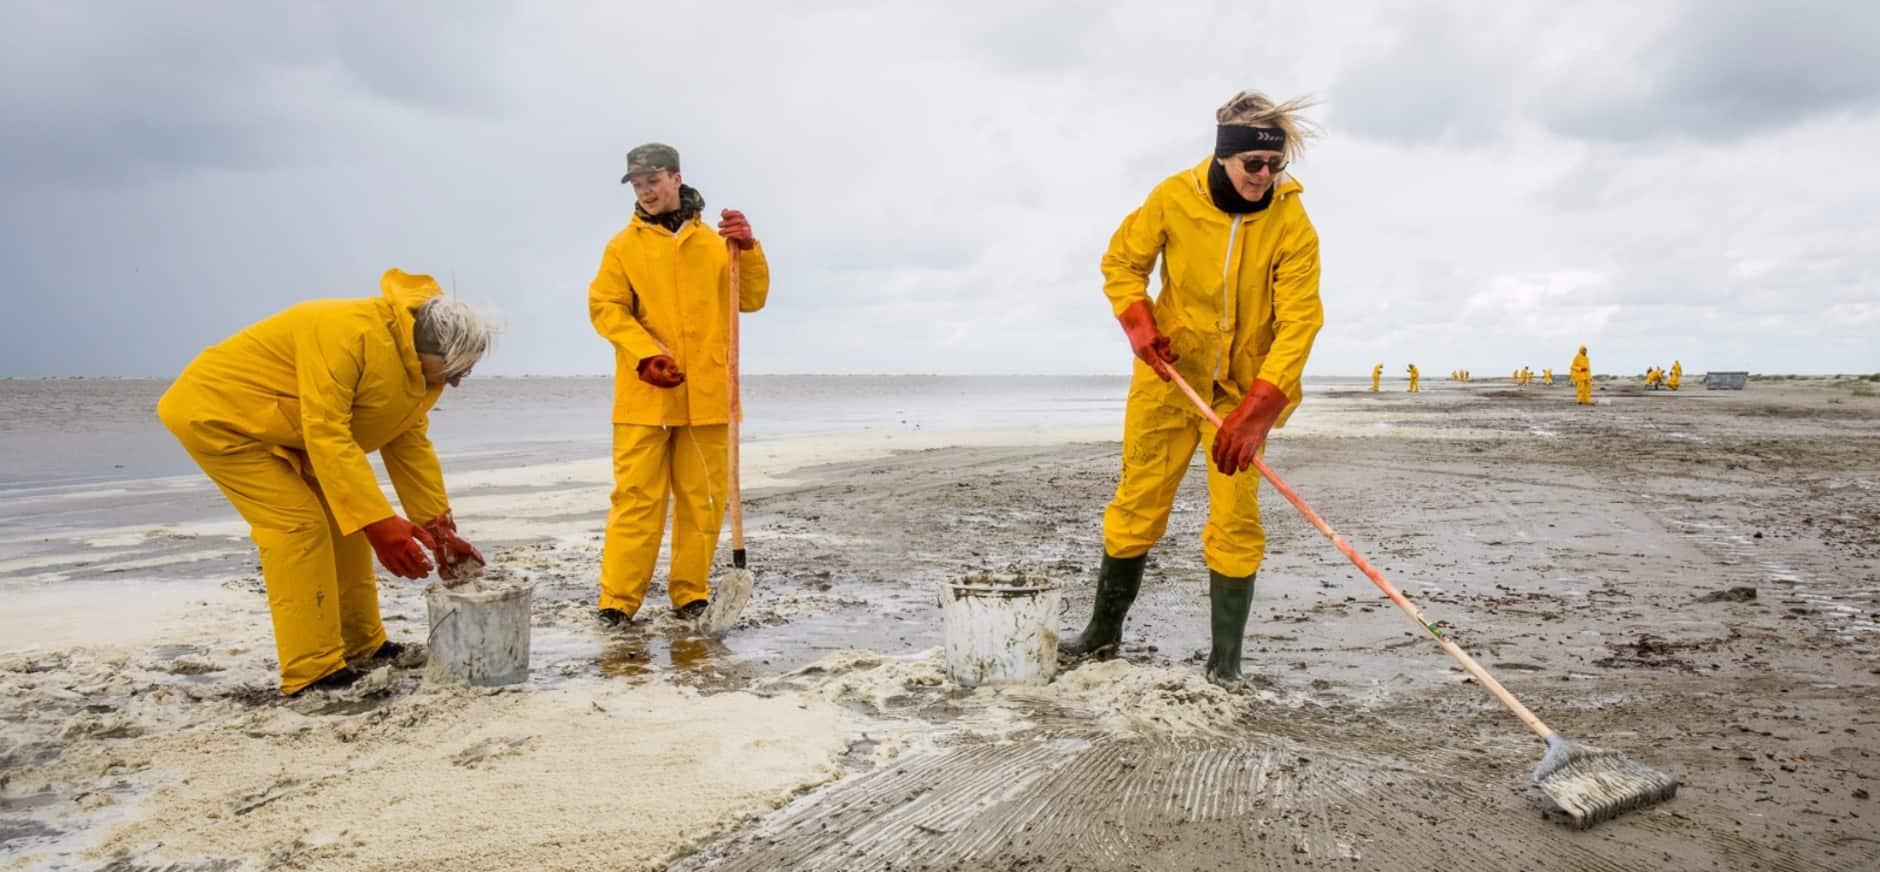 Geslaagde oefening oliebestrijding op Waddenzee